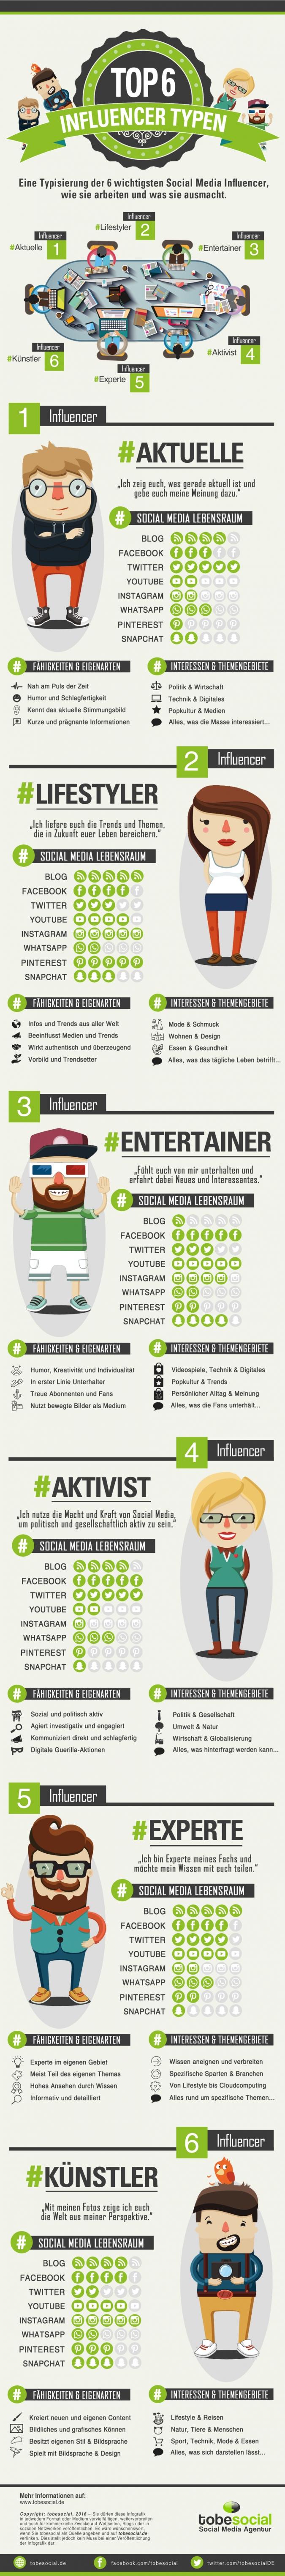 Social Media Influencer Typen